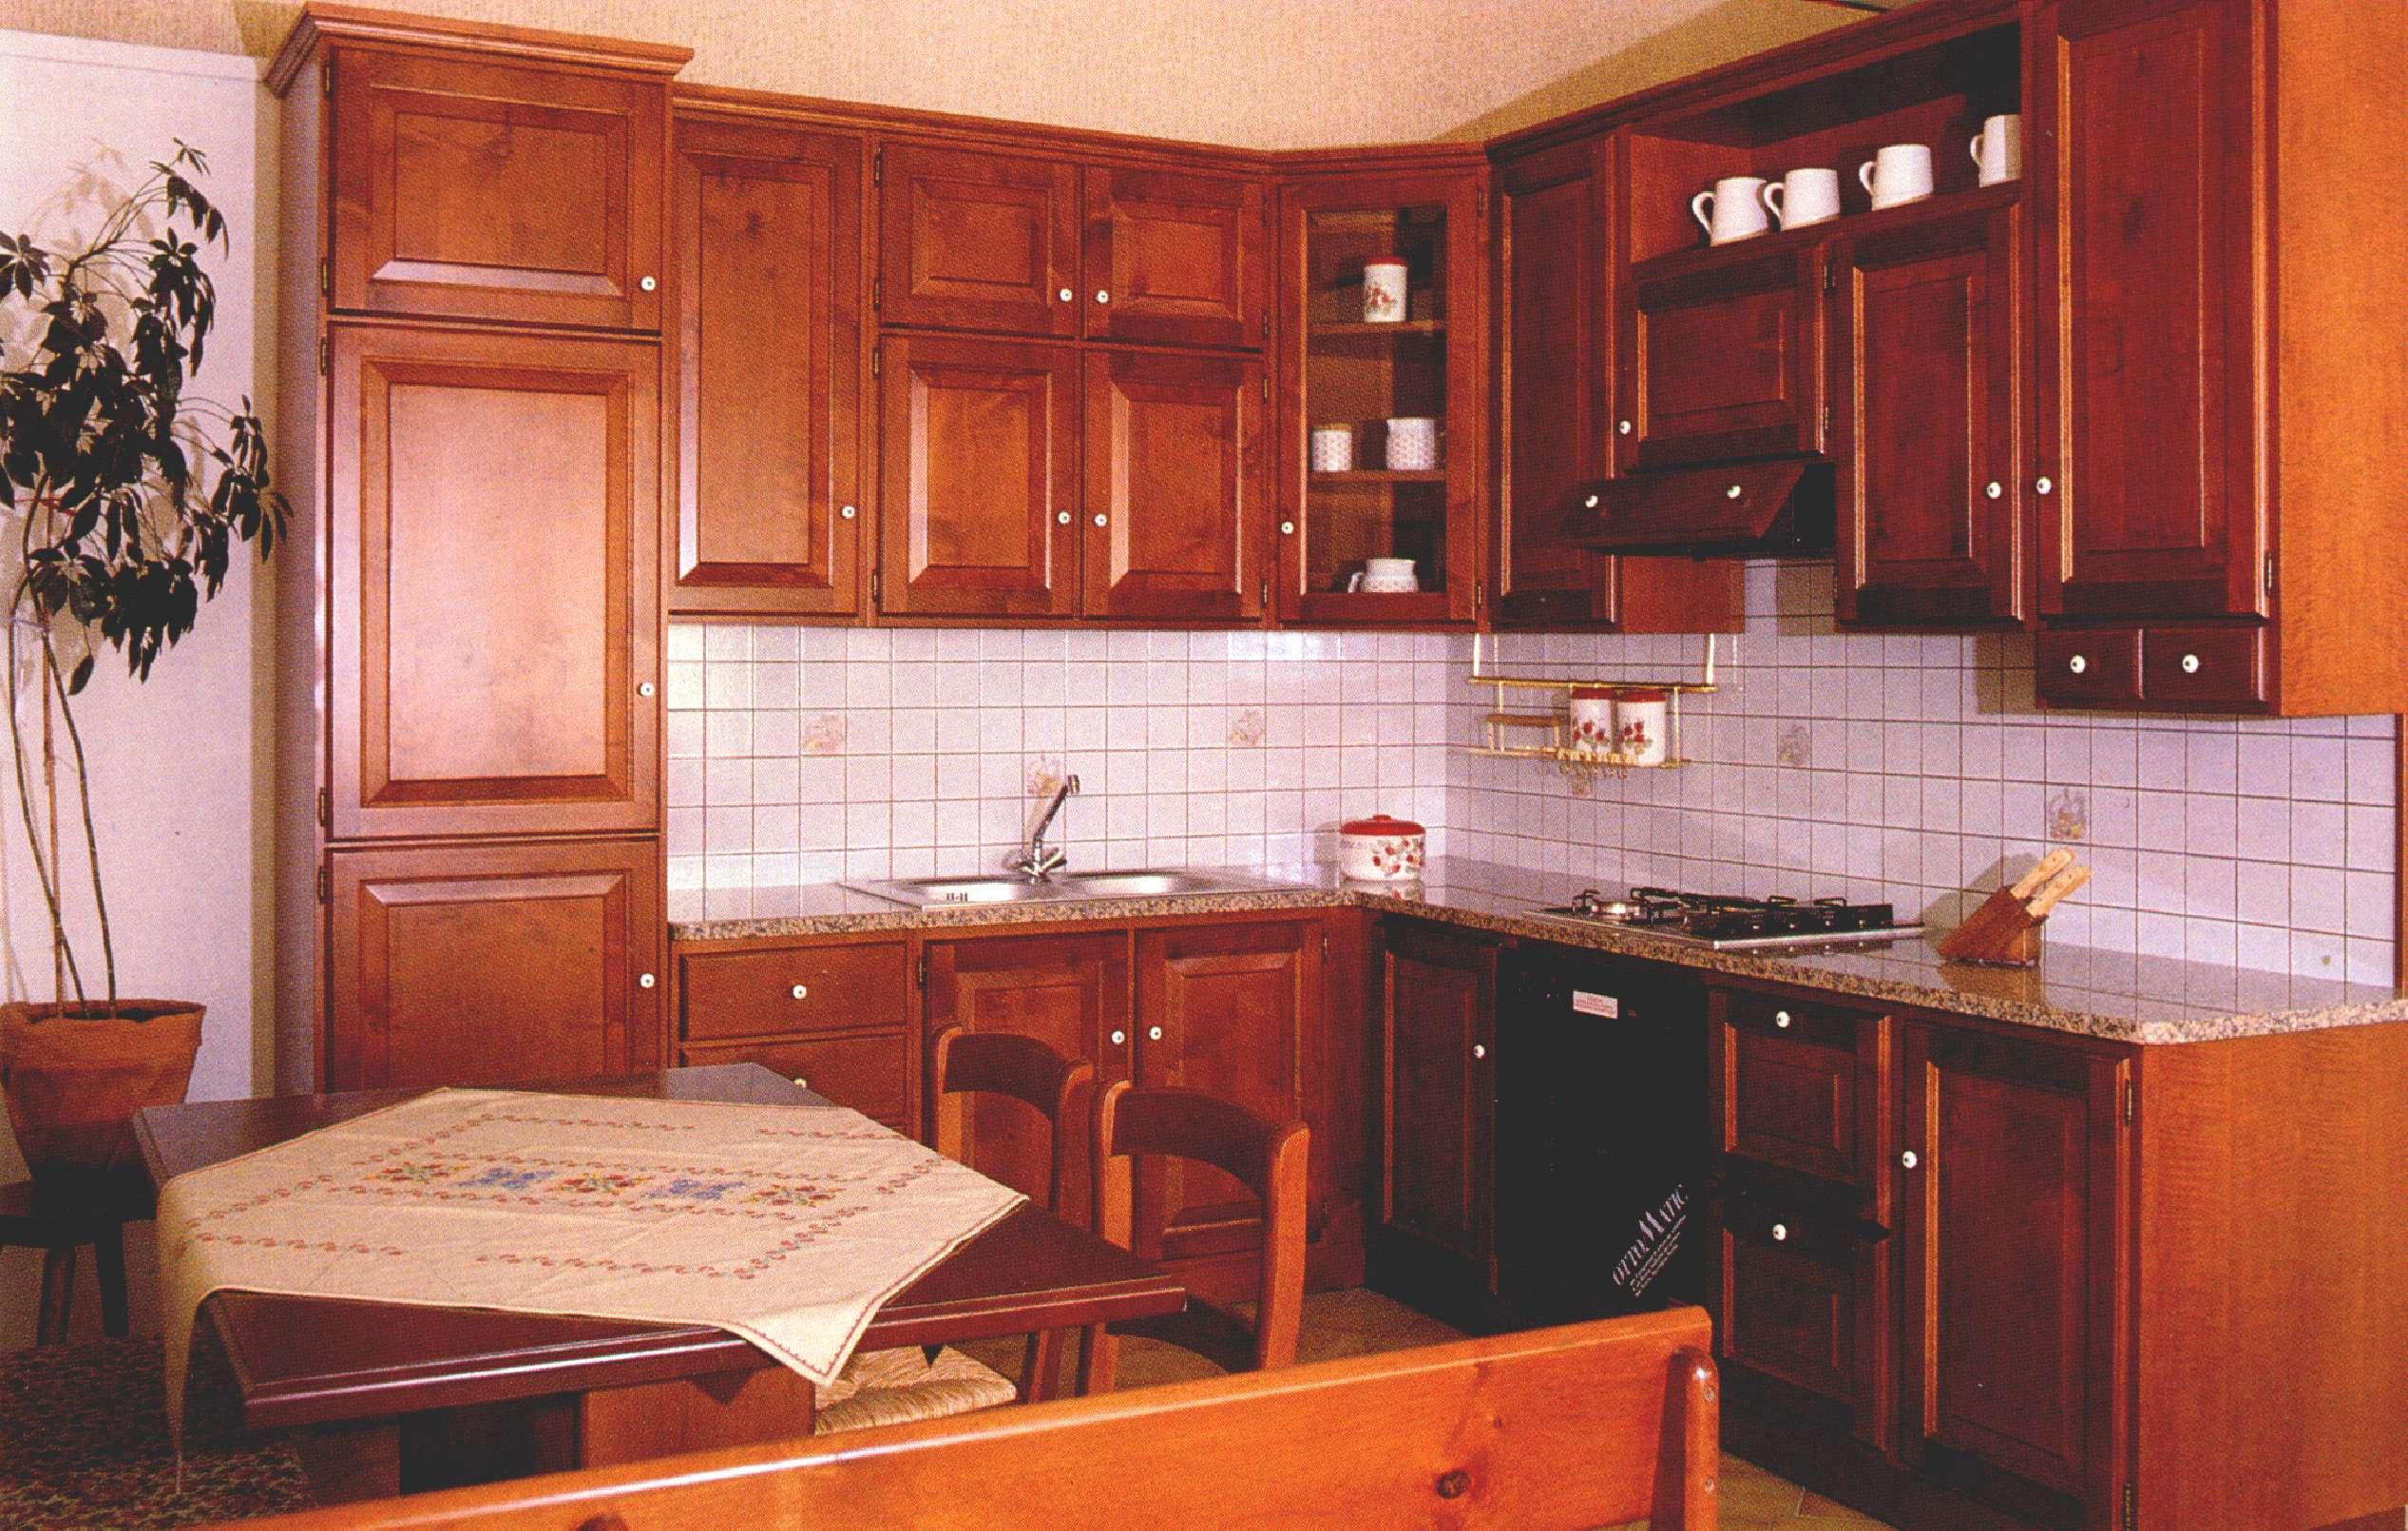 Galleria Di Immagini E Foto Cucine In Muratura Quotes #AE4E1D 2534 1611 Immagini Di Cucine Ernestomeda